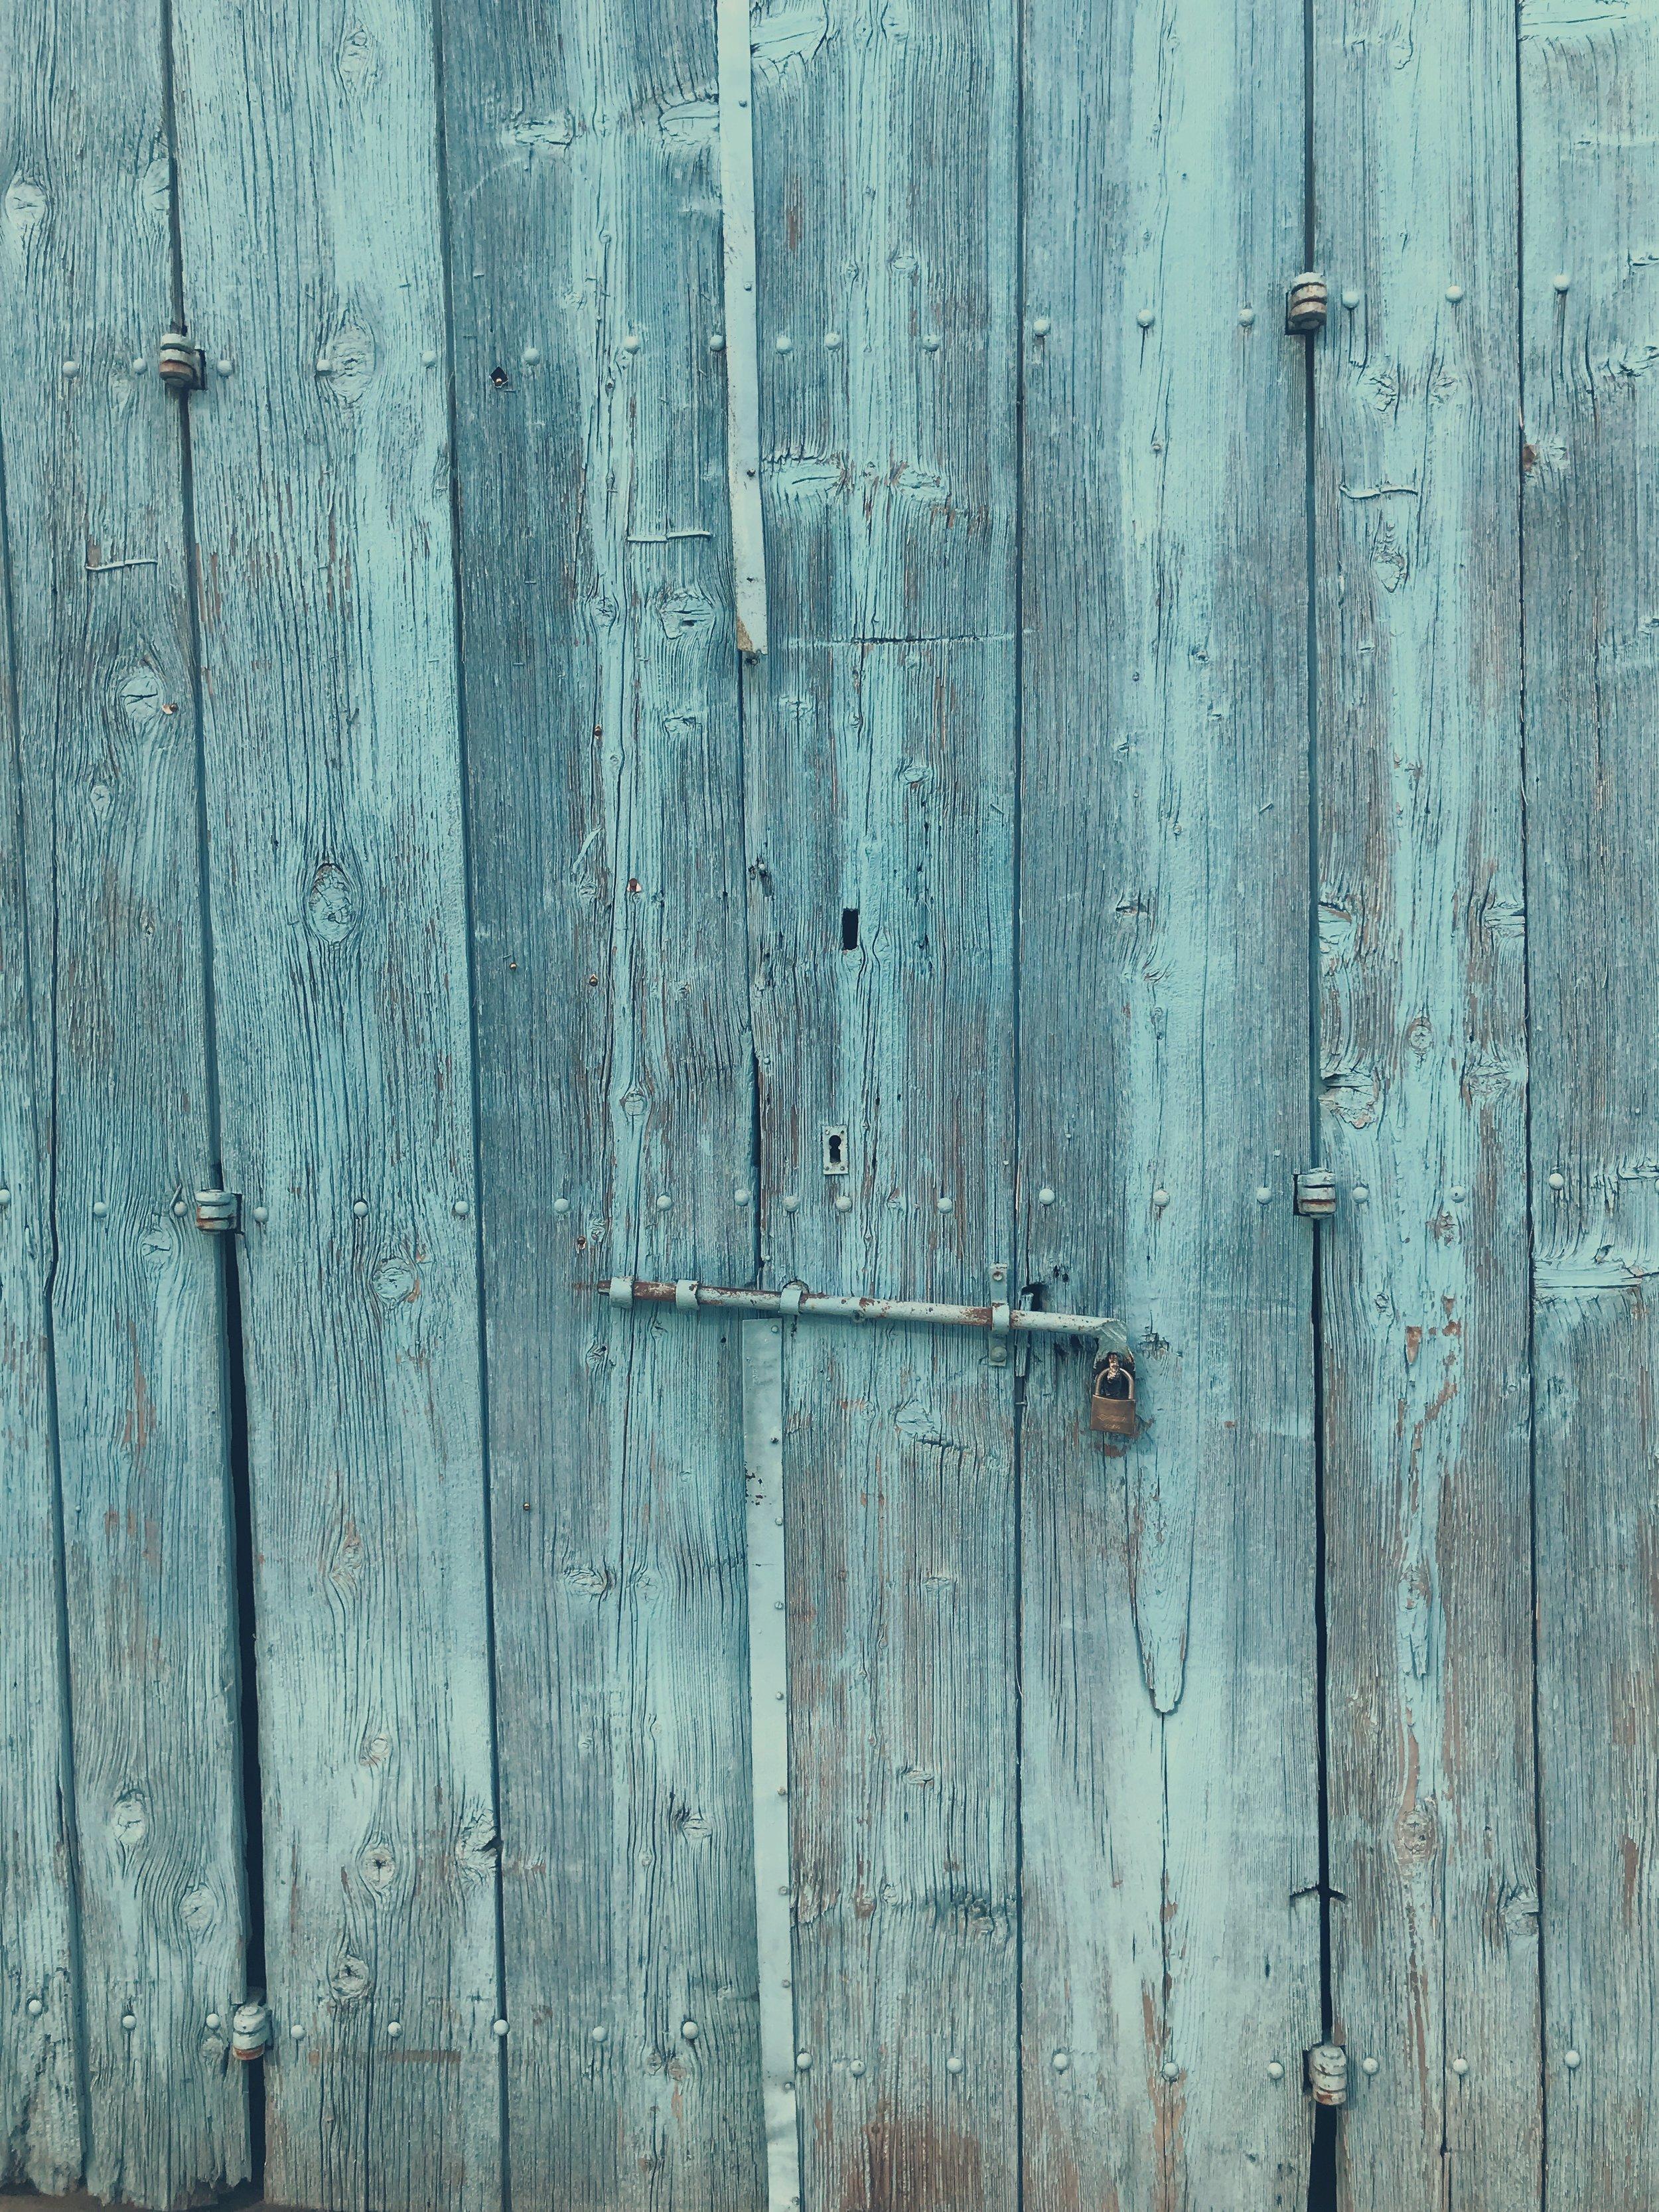 Blue door Cyprus www.lindahaggh.com.jpg